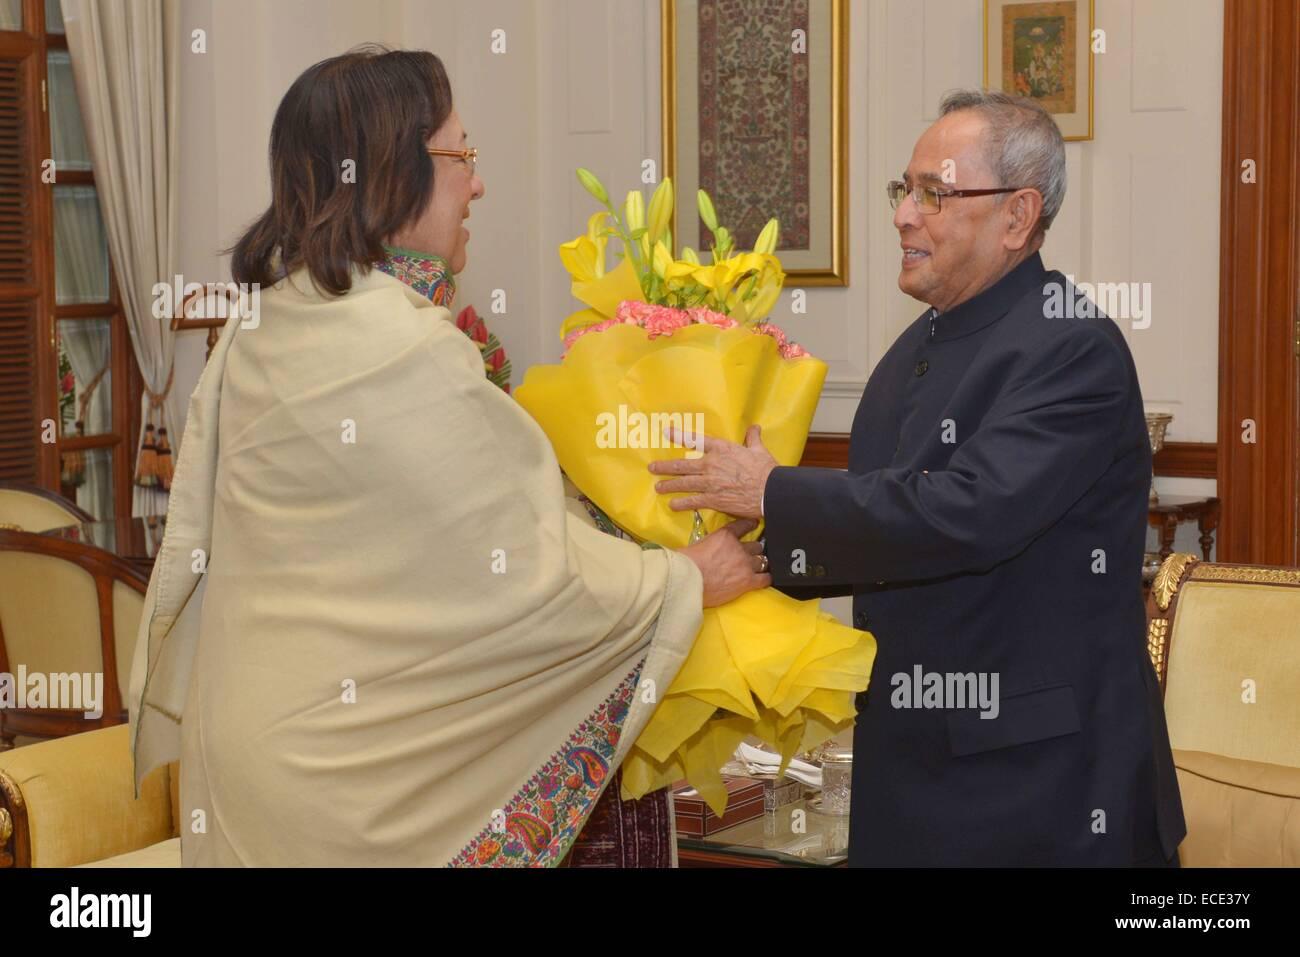 New Delhi India 11th Dec 2014 The President Of India Shri